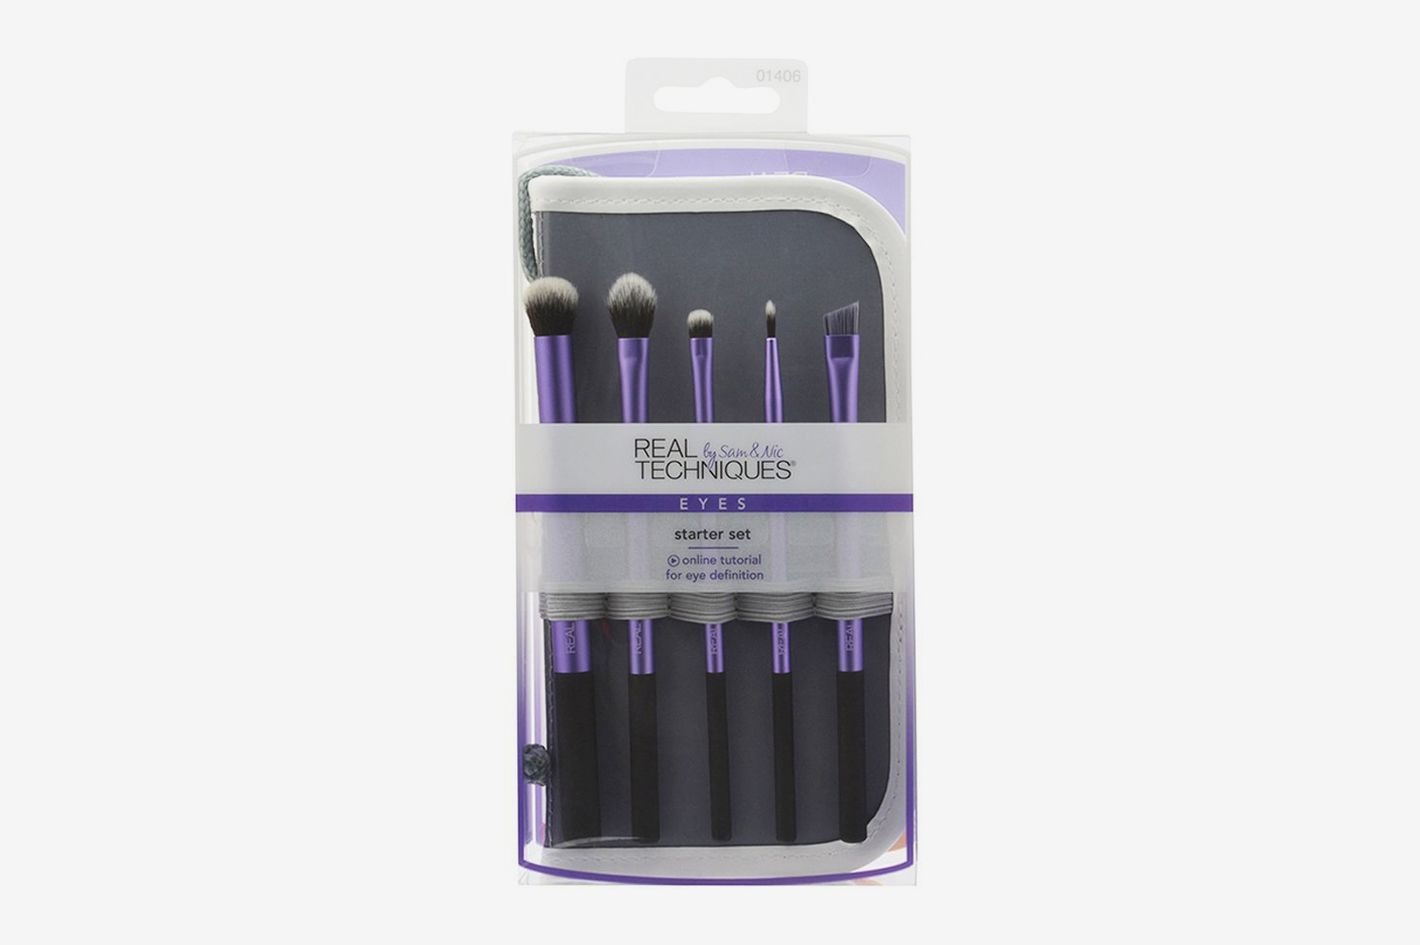 Real Techniques Starter Makeup Brush Set